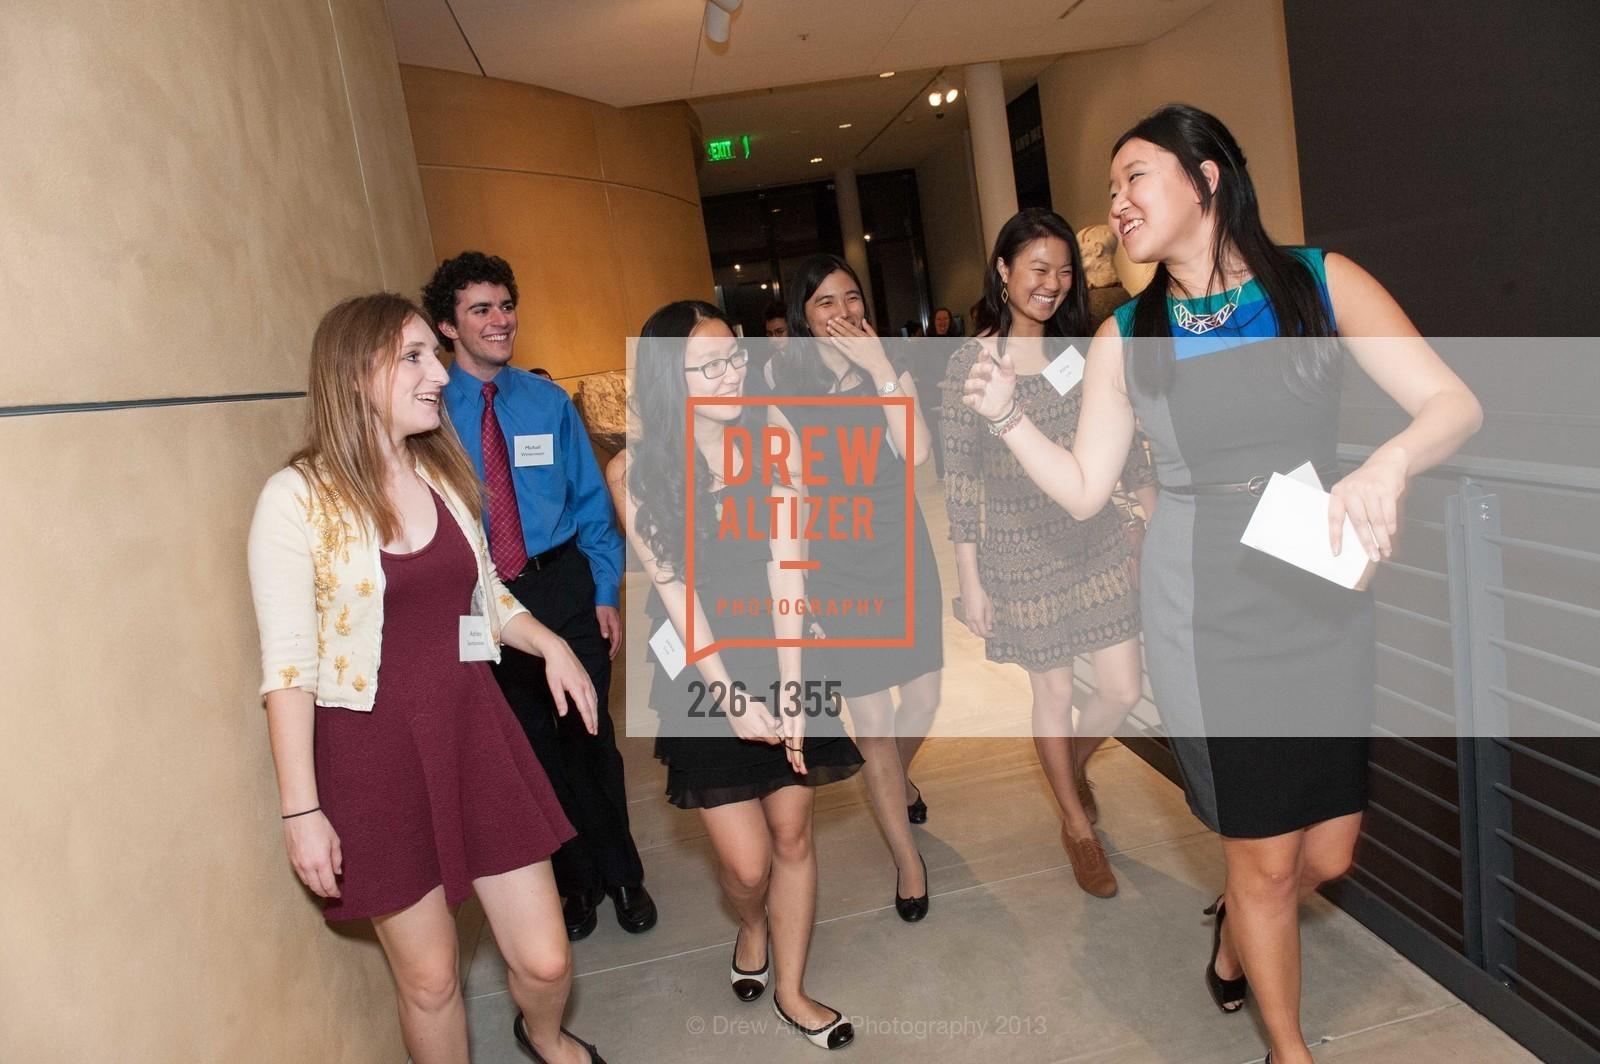 Ashley Semanskee, Michael Wintermeyer, Jackie Low, Alina Luk, Asia Chiao, Photo #226-1355